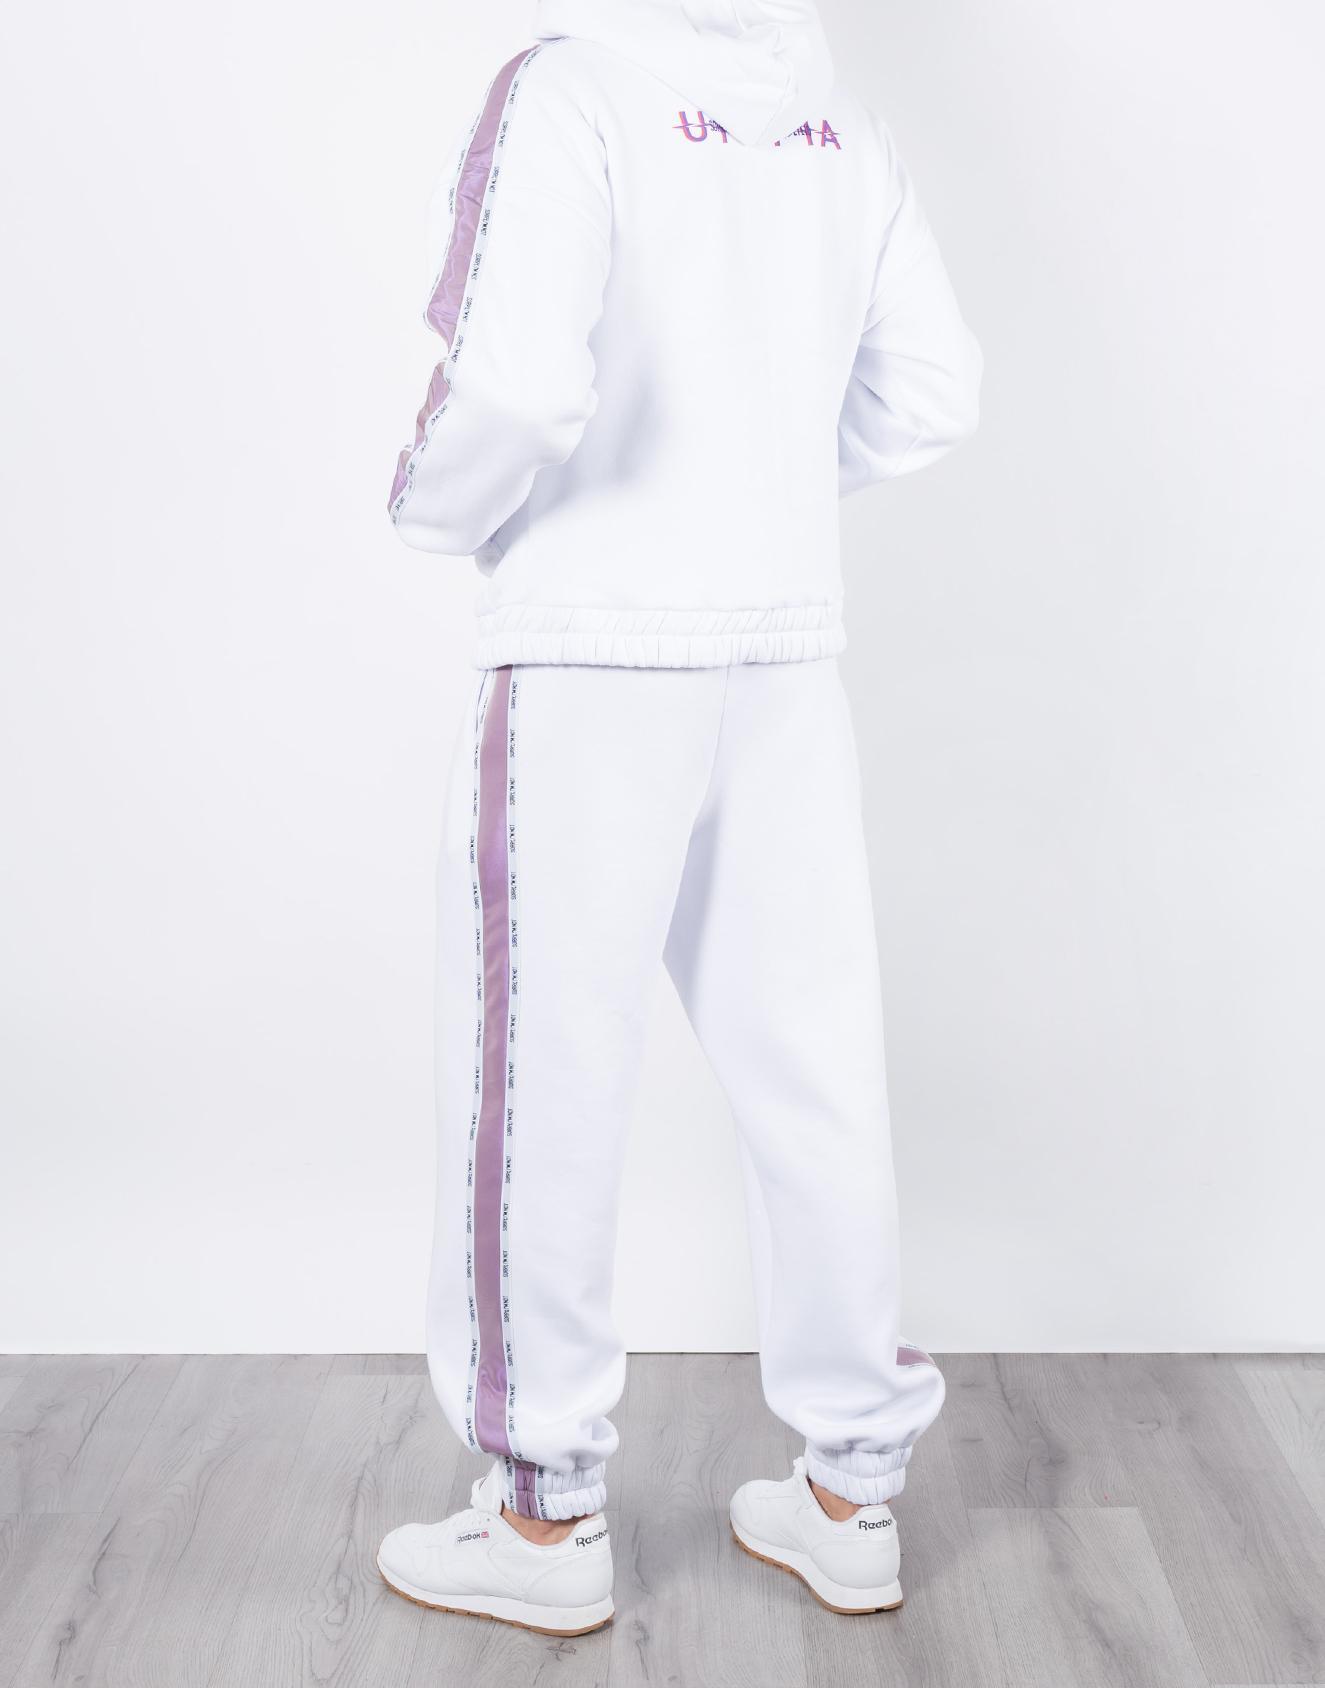 олимп бел м 5